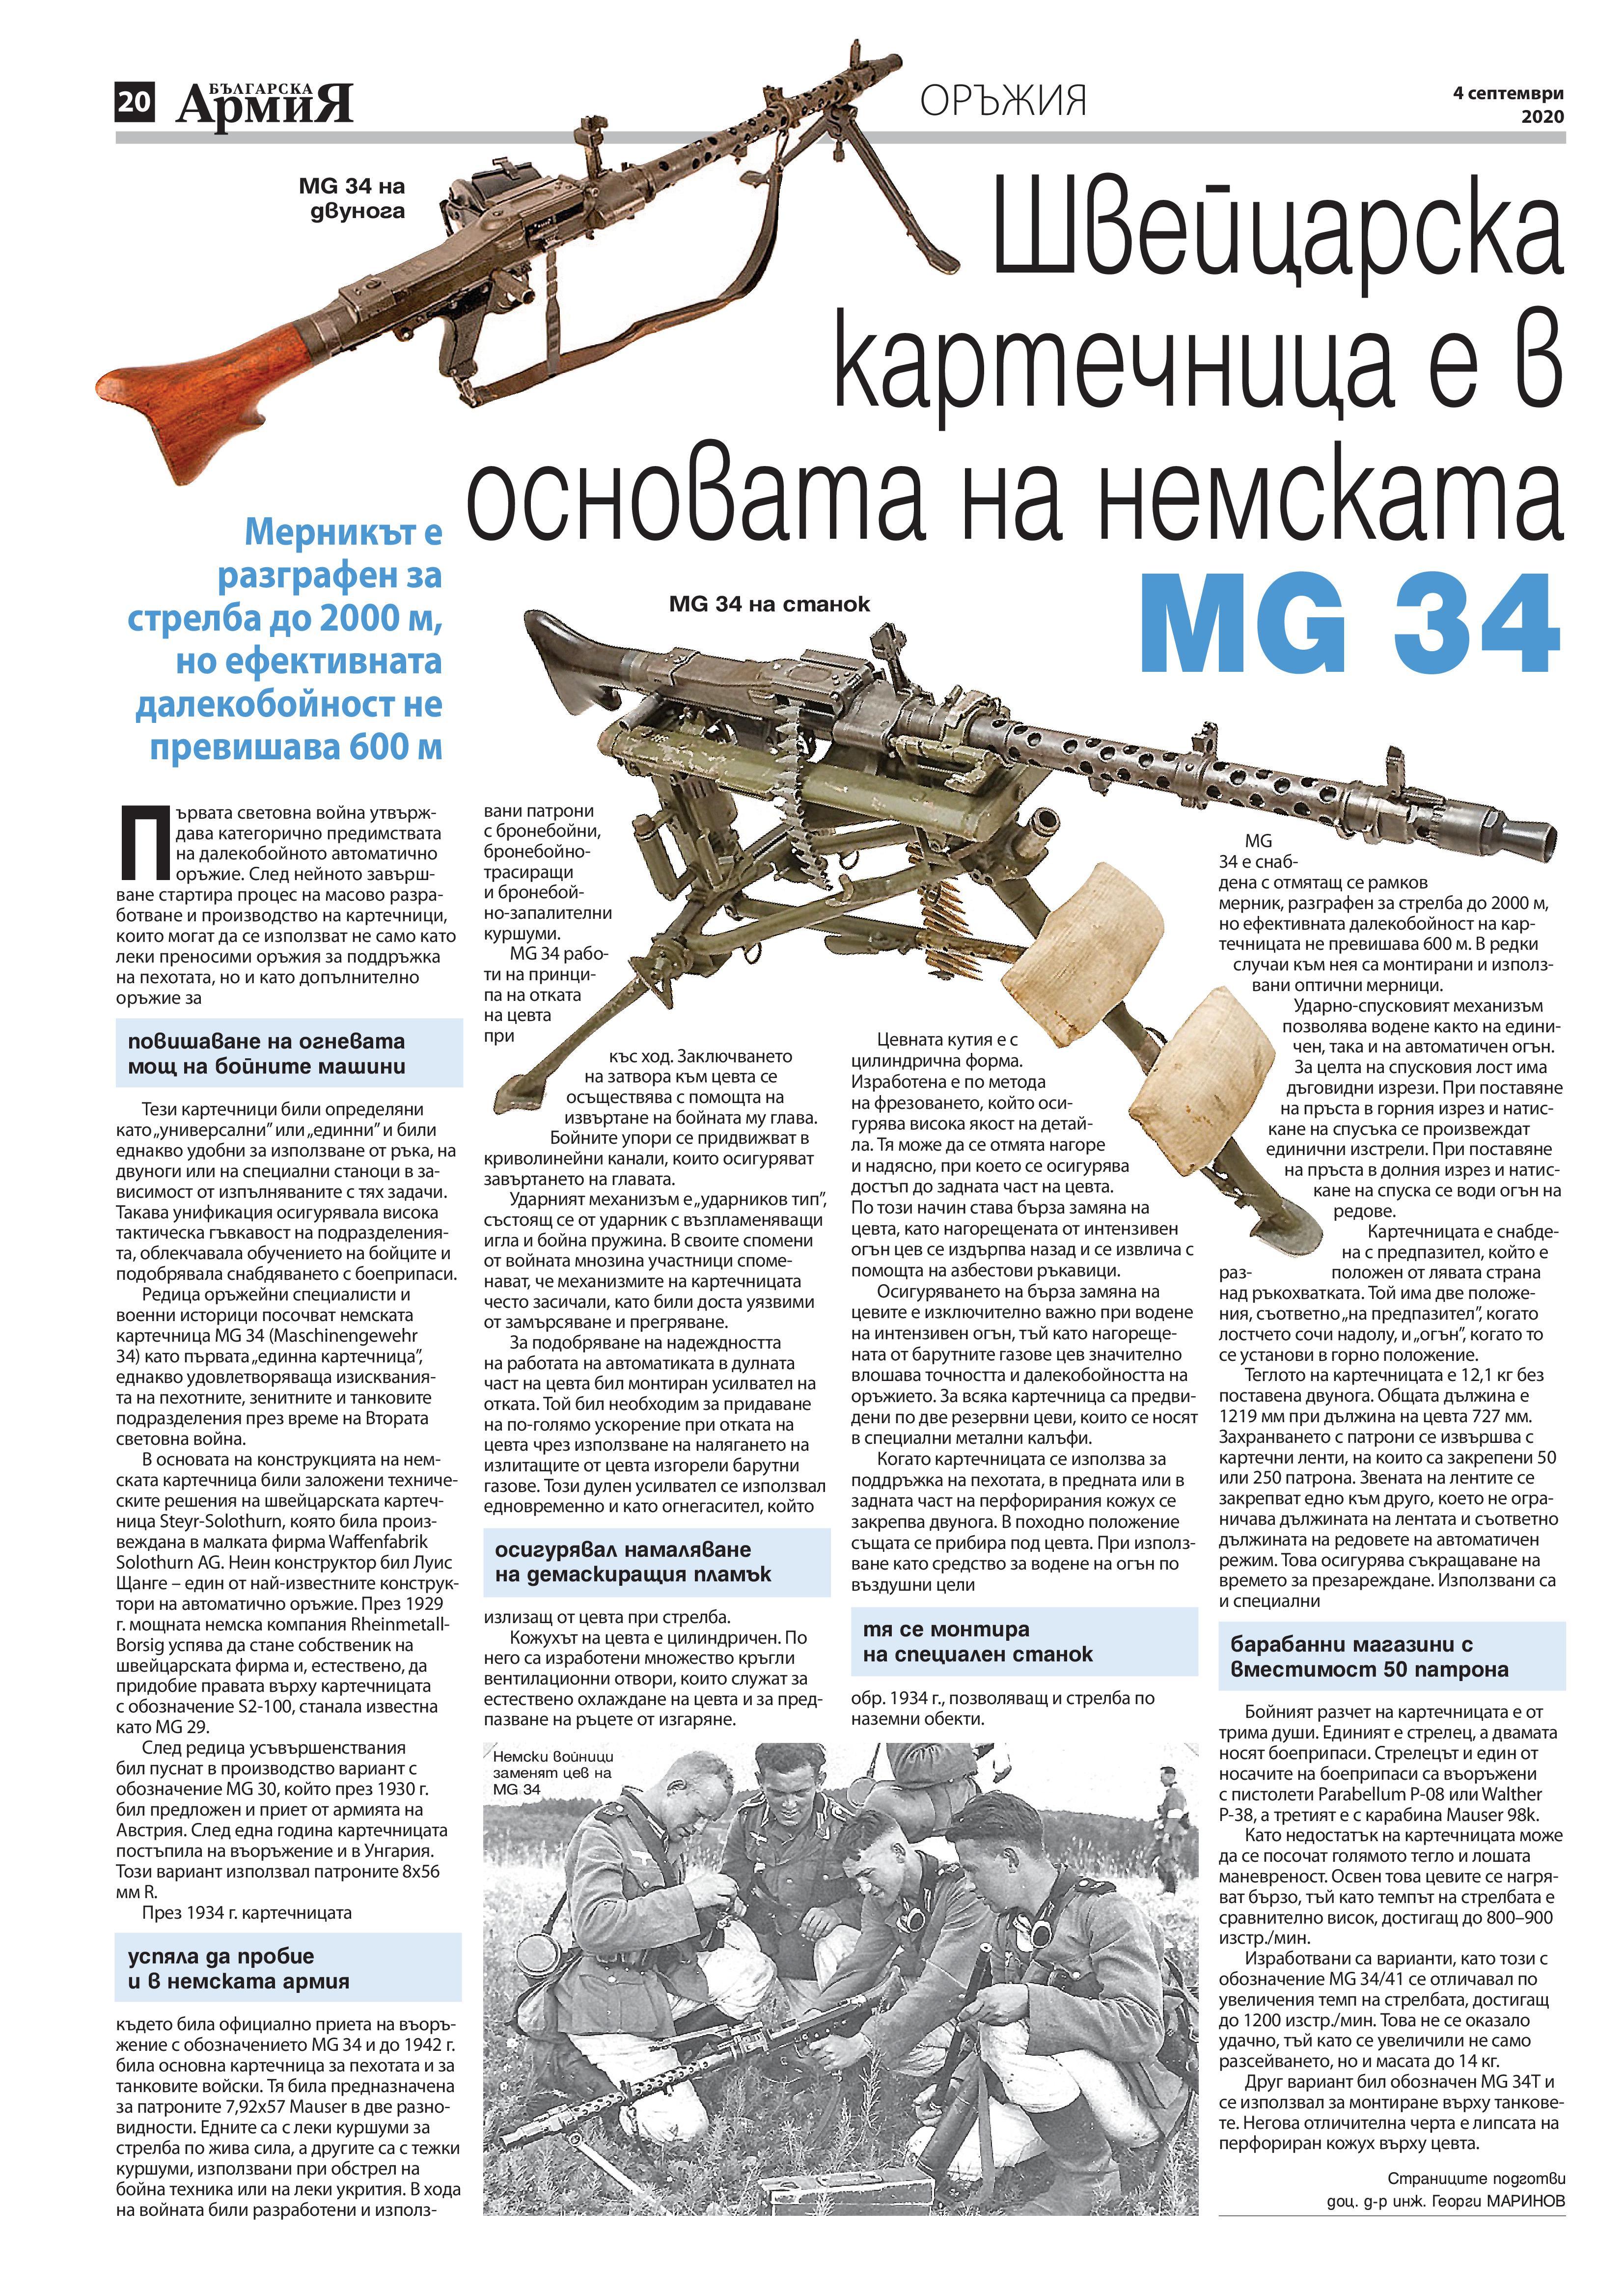 https://www.armymedia.bg/wp-content/uploads/2015/06/20-39.jpg